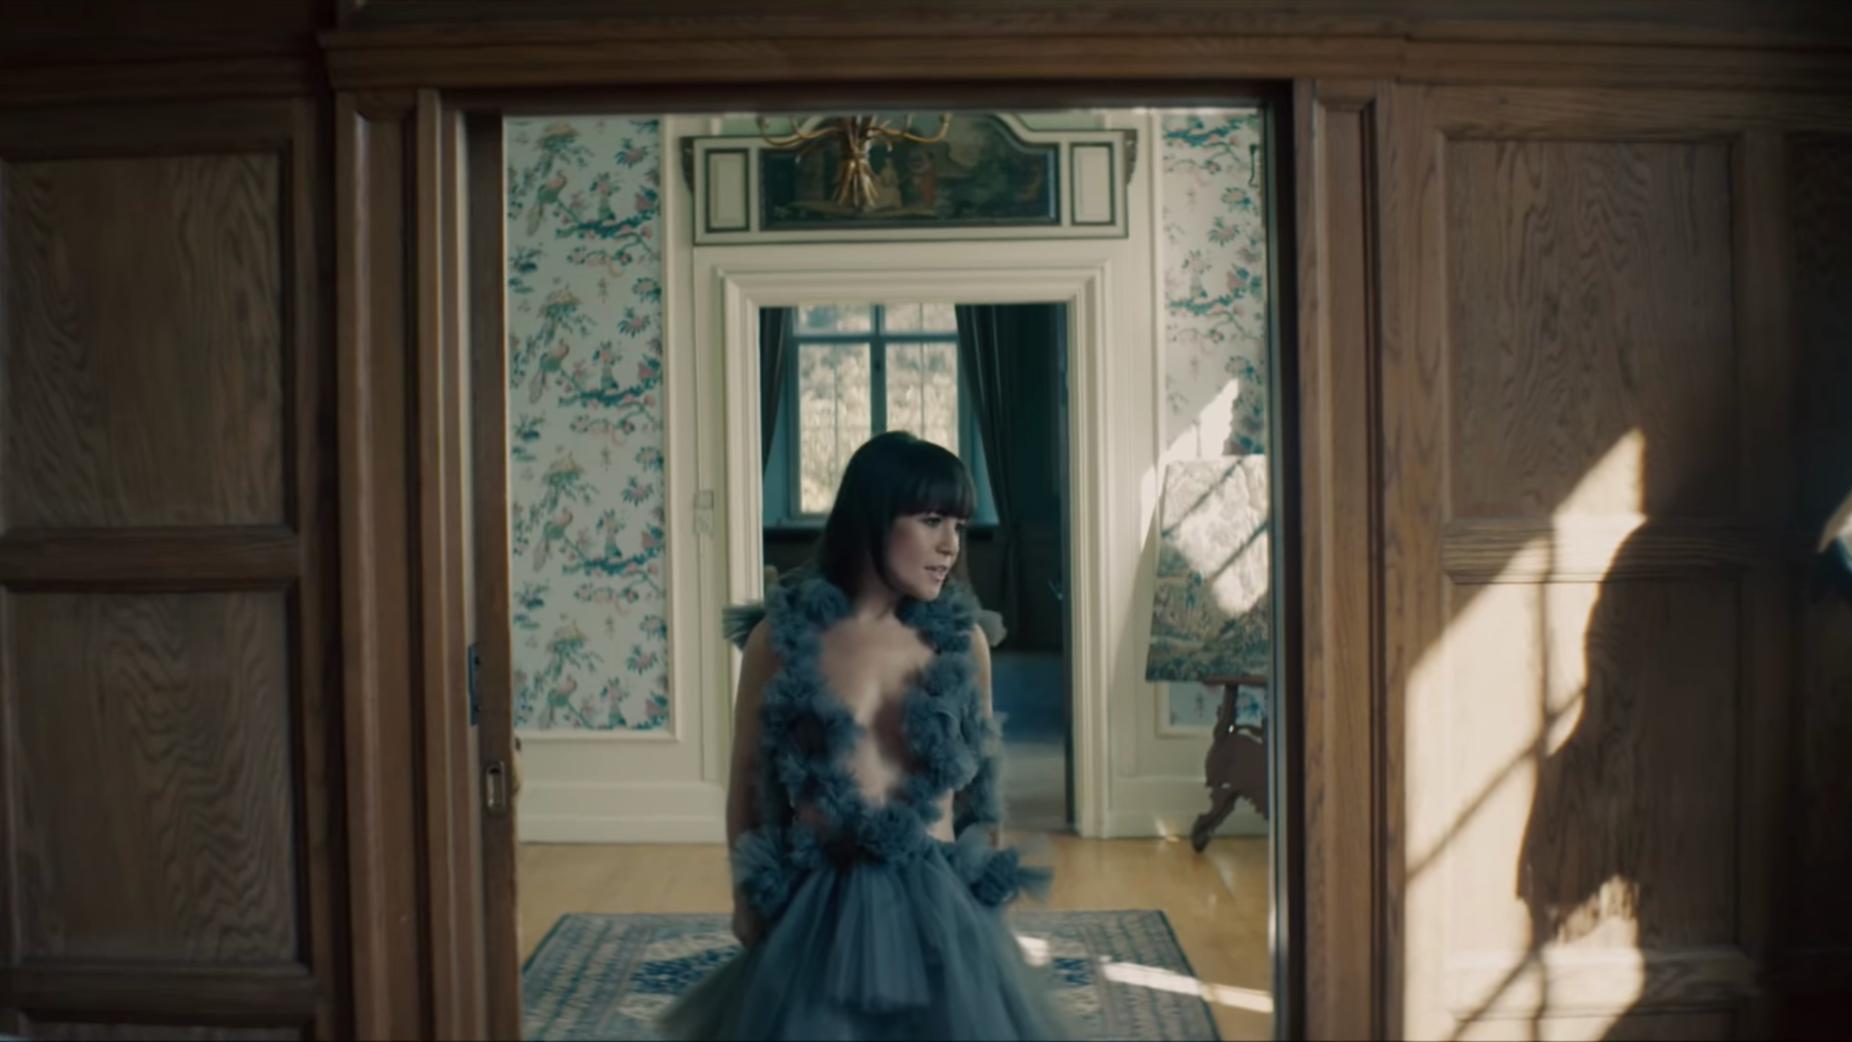 DREAMING KIND - MUSIC VIDEOARTIST HANNAH SCHNEIDERDIRECTOR CHRISTOPHE DOLCEROCCA